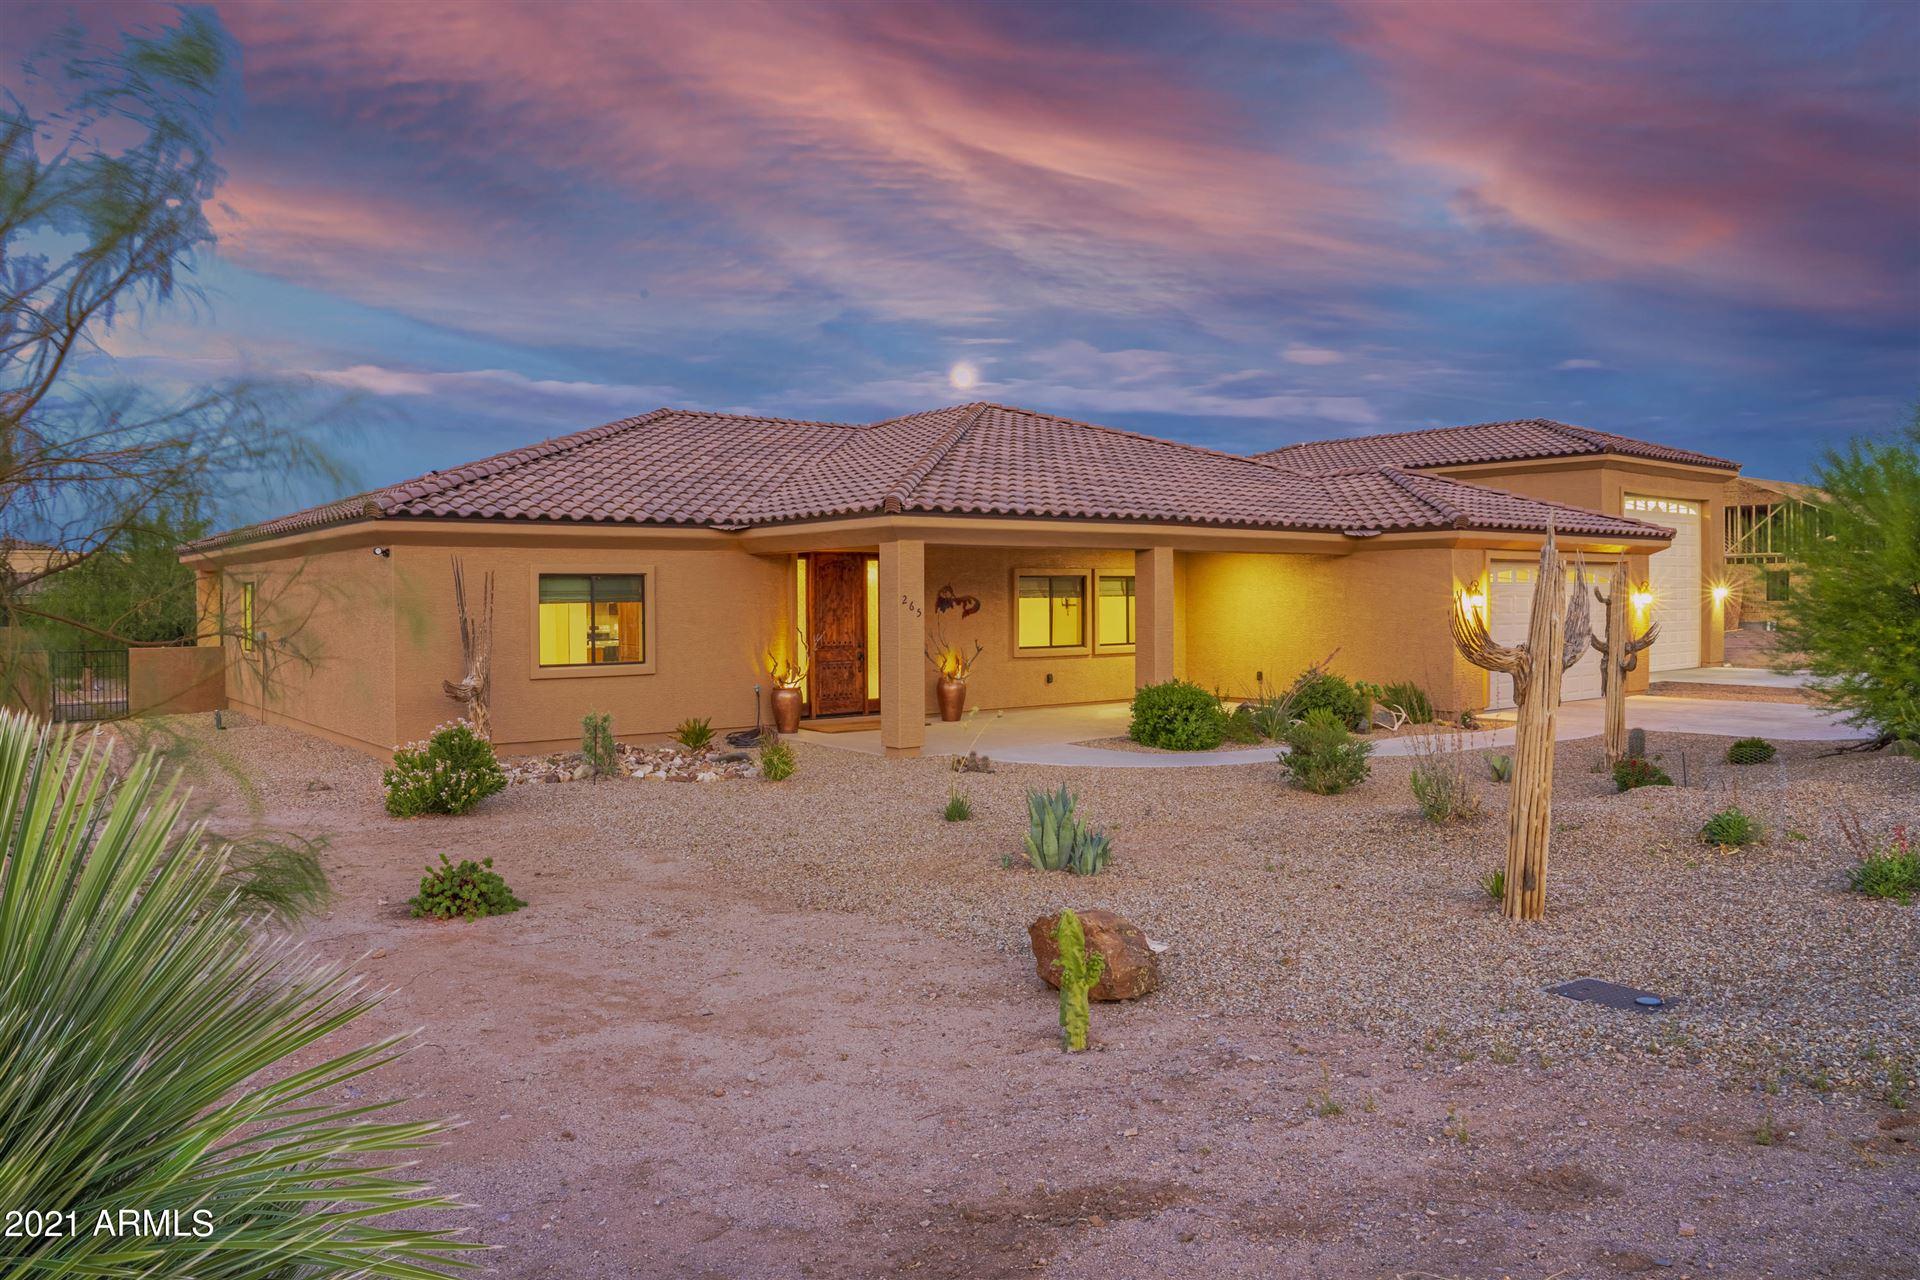 265 SHAWNEE Drive, Wickenburg, AZ 85390 - MLS#: 6237711